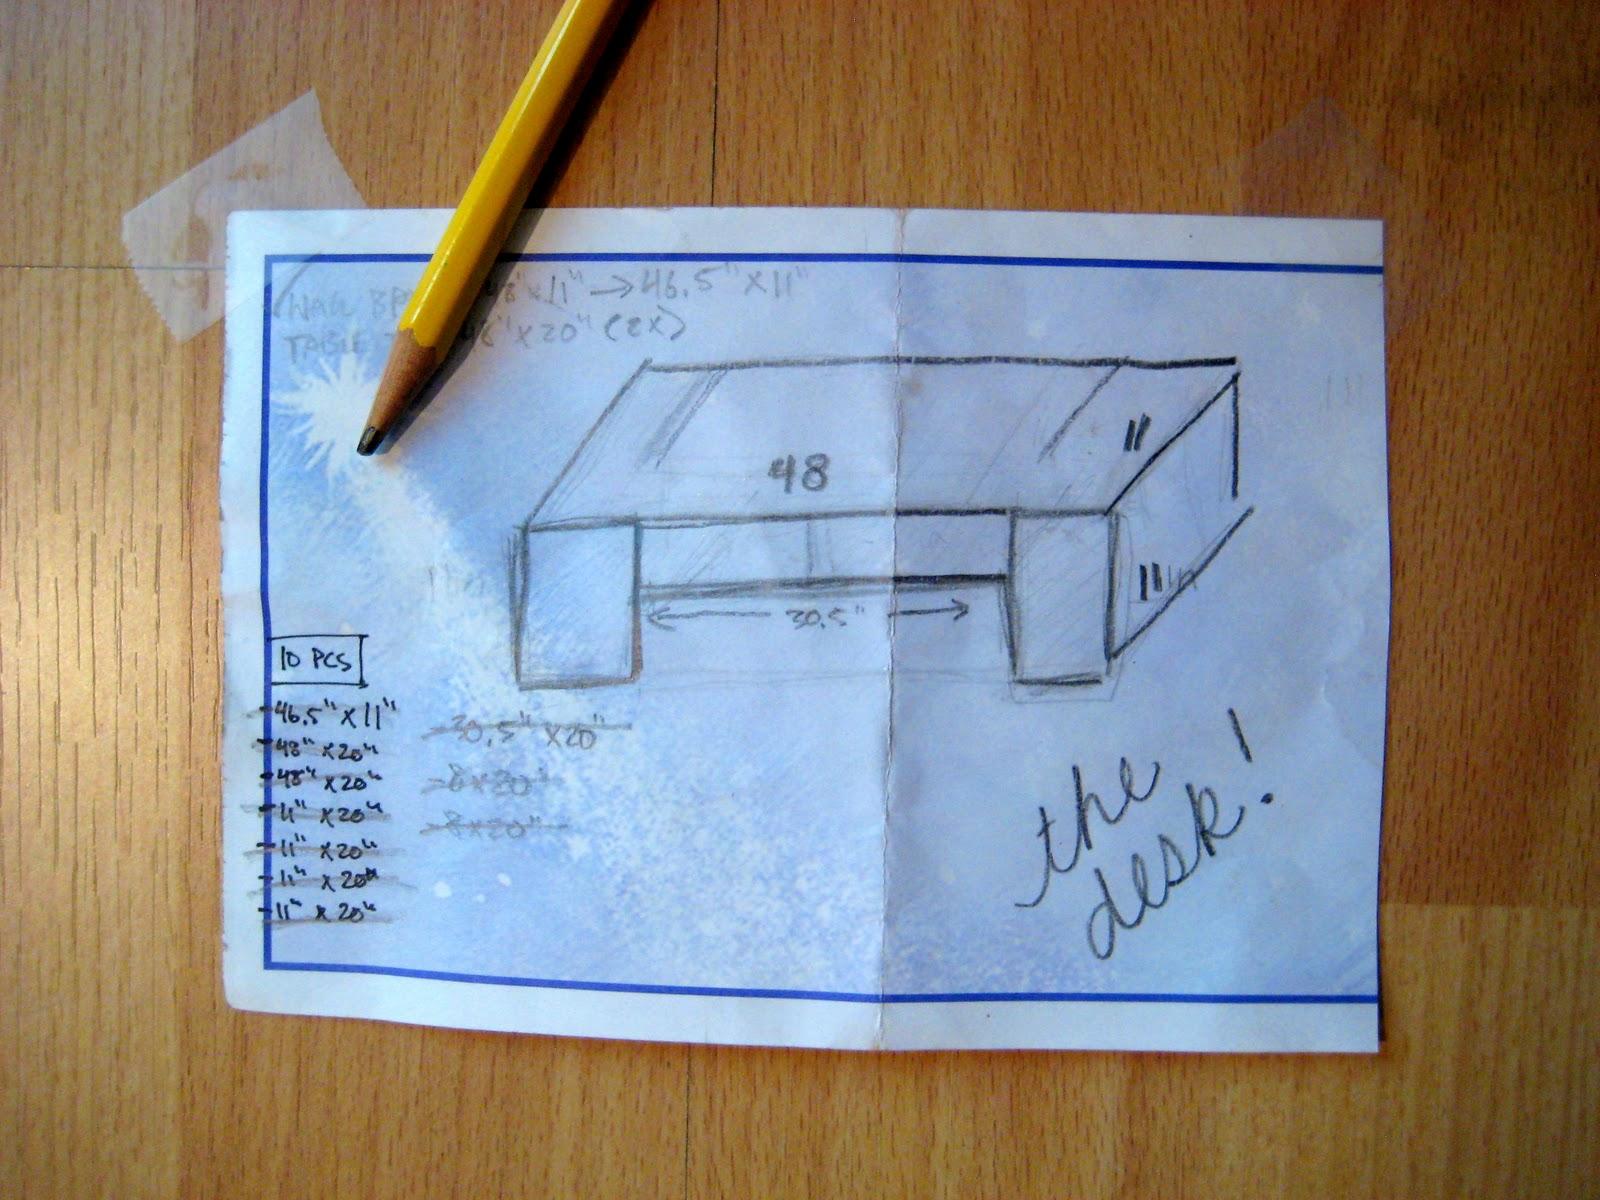 C.R.A.F.T. in progress: Suspended Desk - C.R.A.F.T.